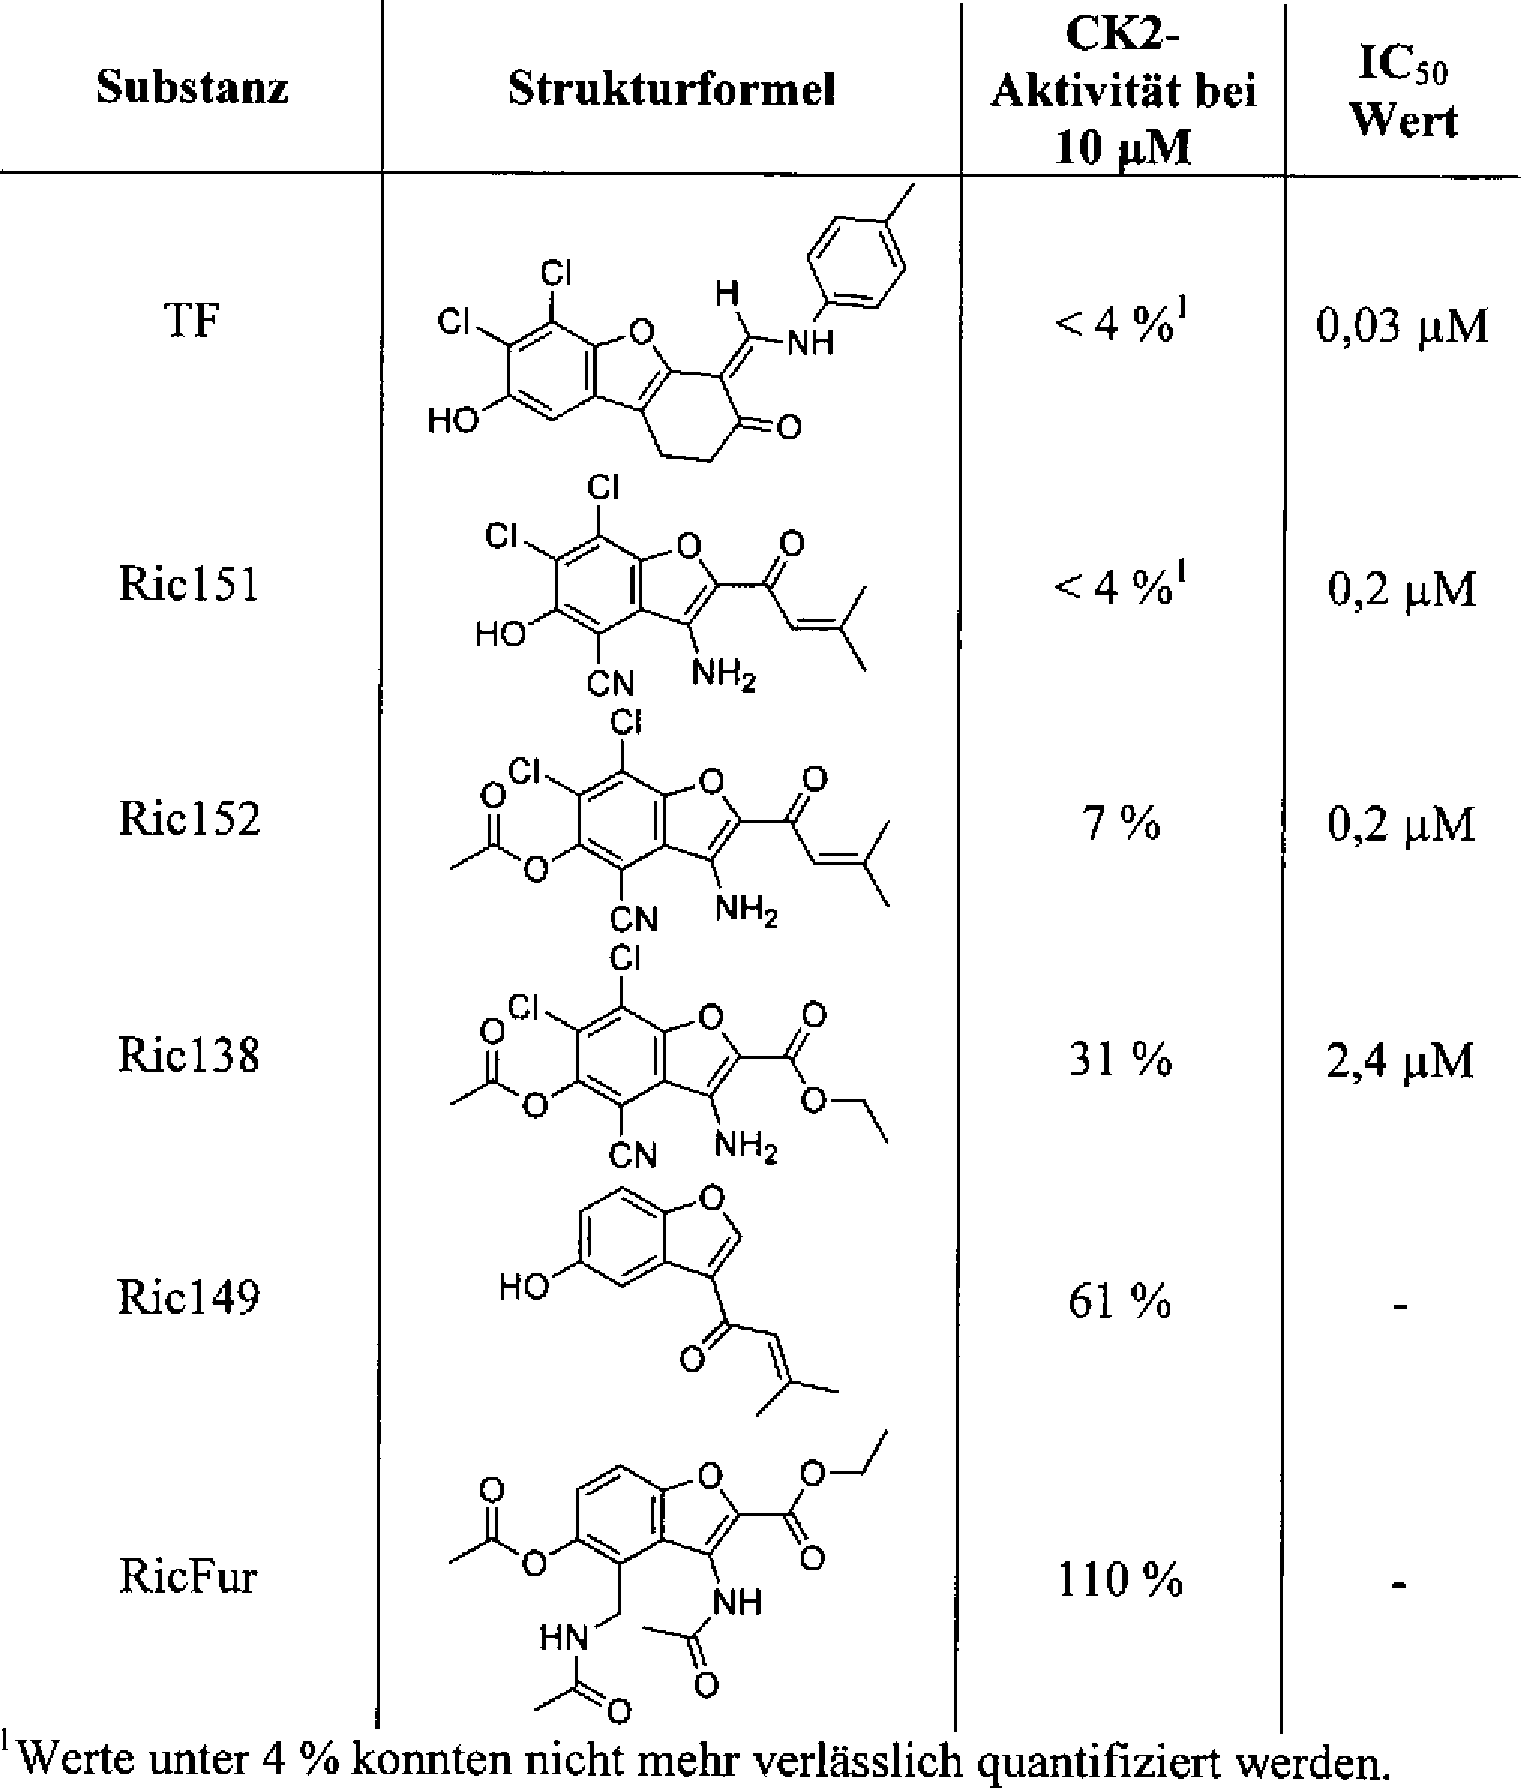 DE102010025173A1 - Using Dibenzofuranonderivaten for inhibiting ...